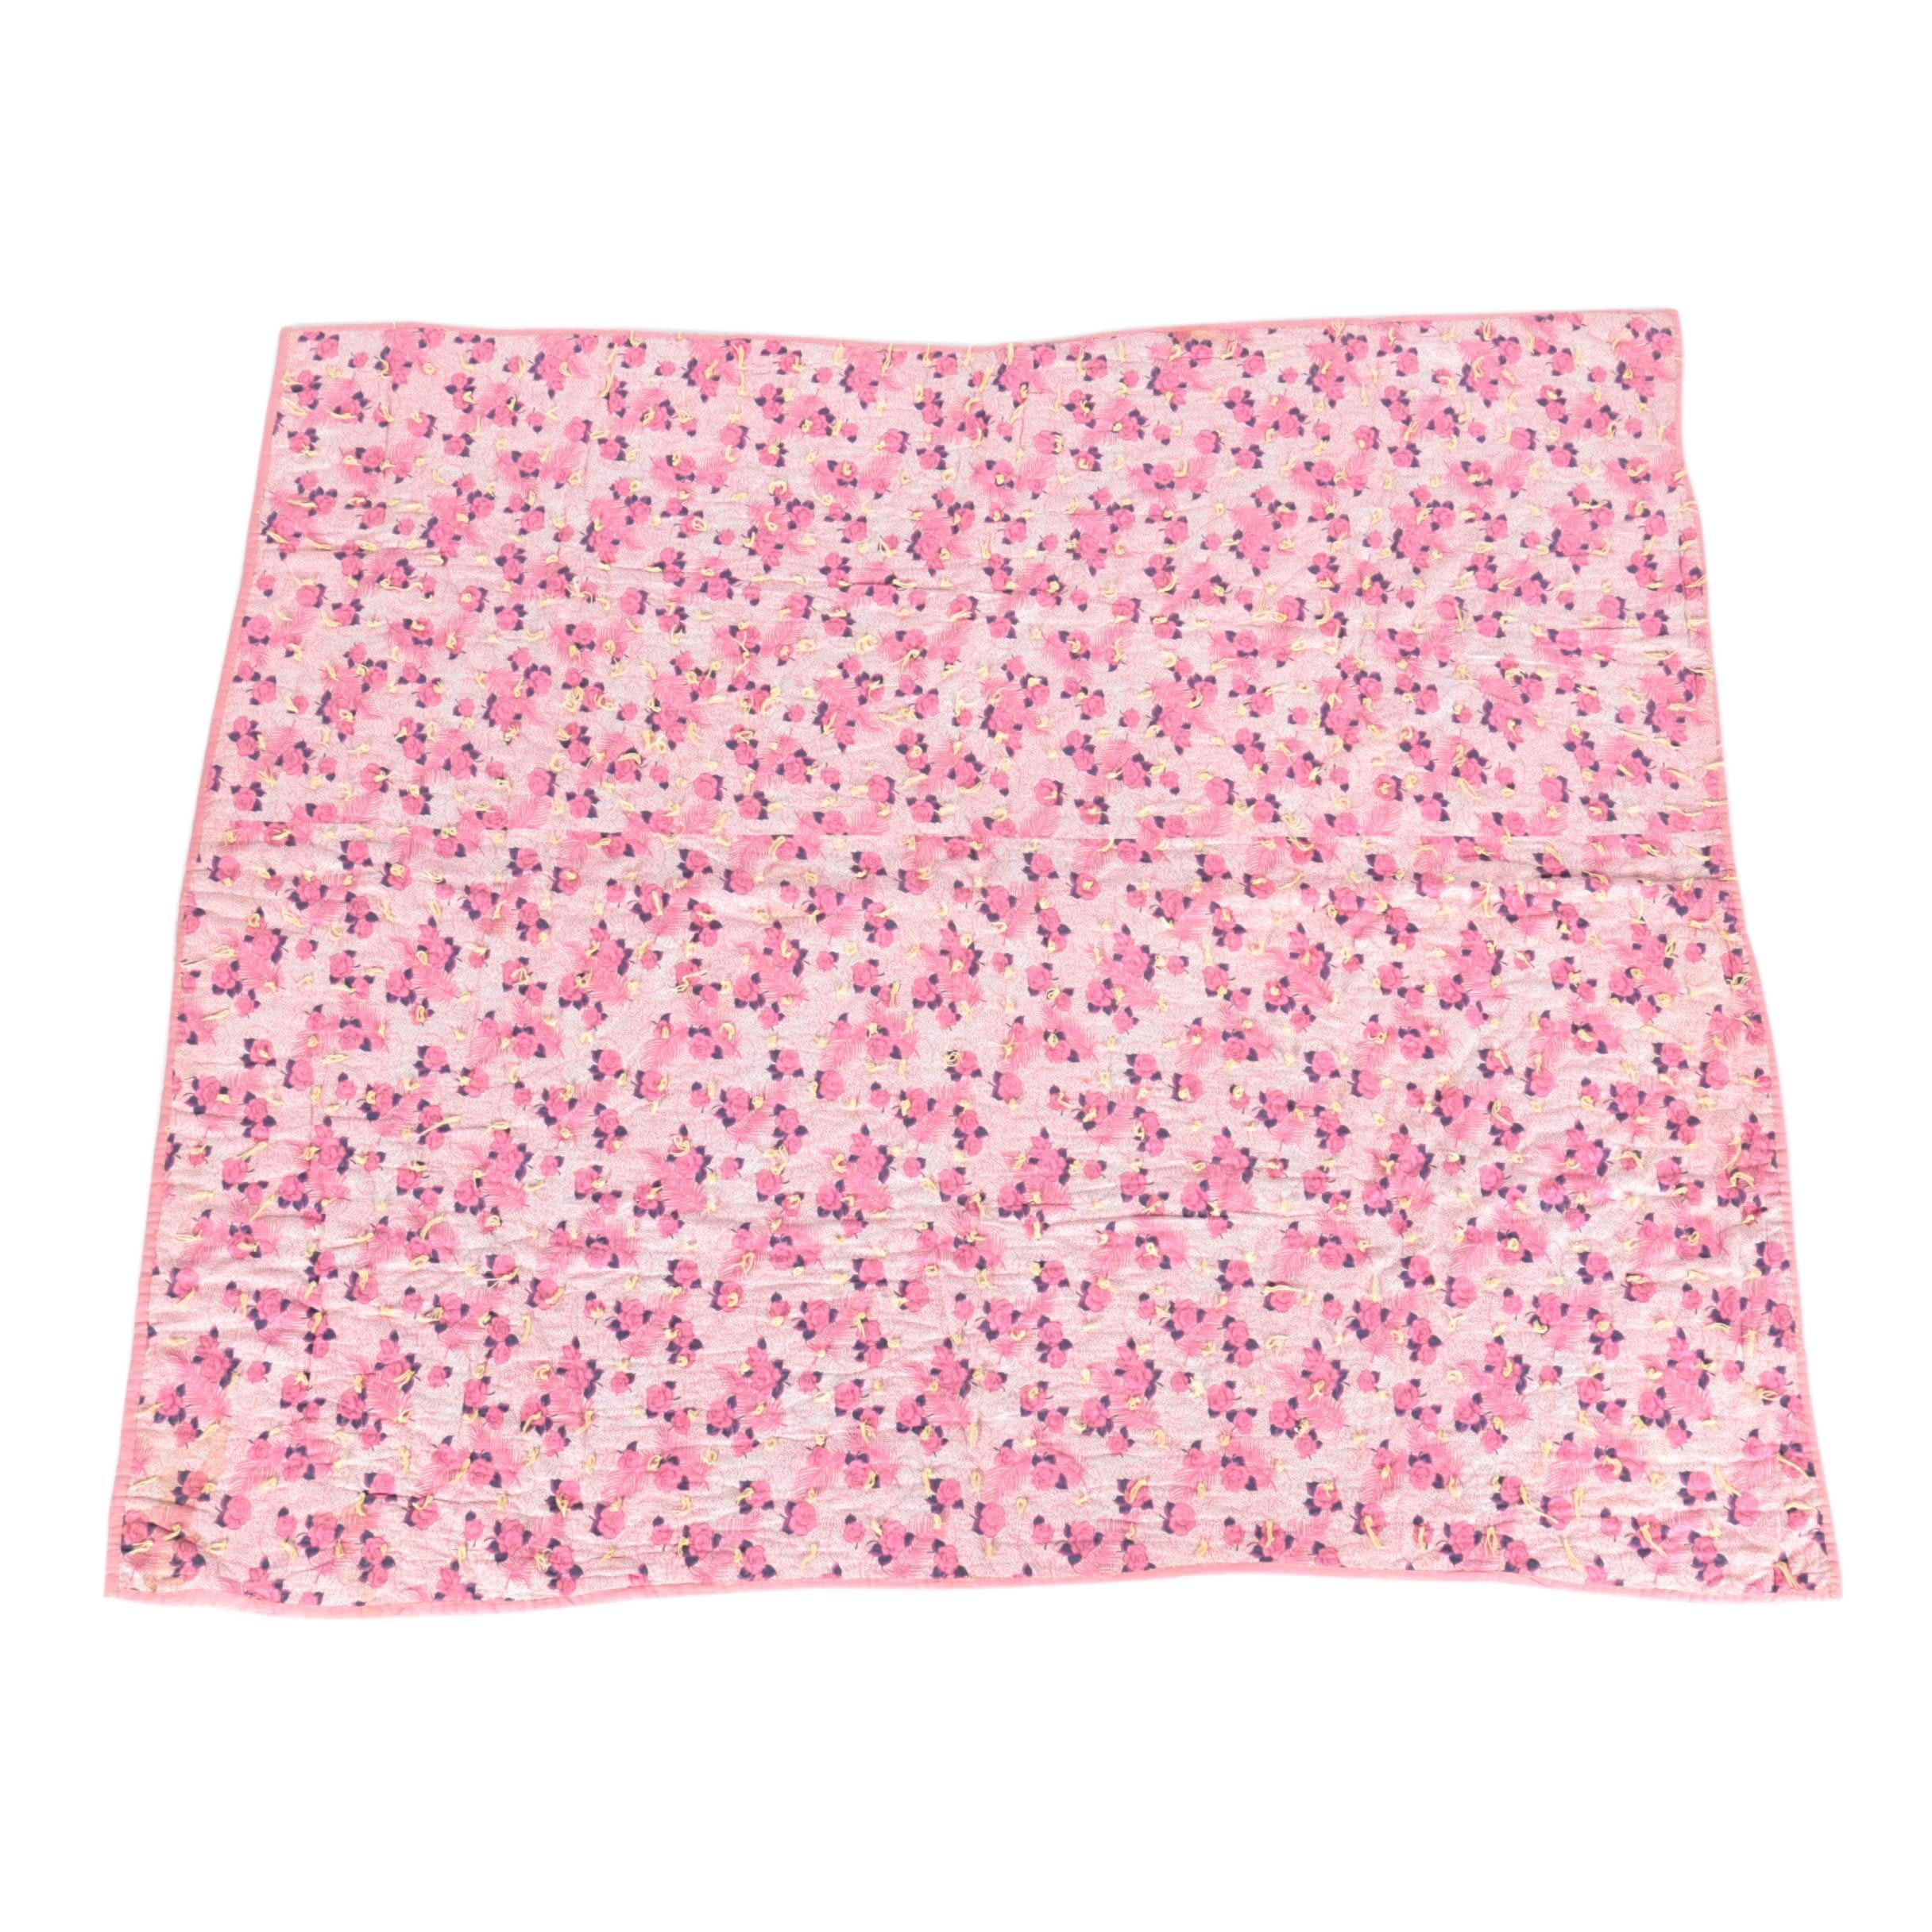 Rose Pattern Quilt